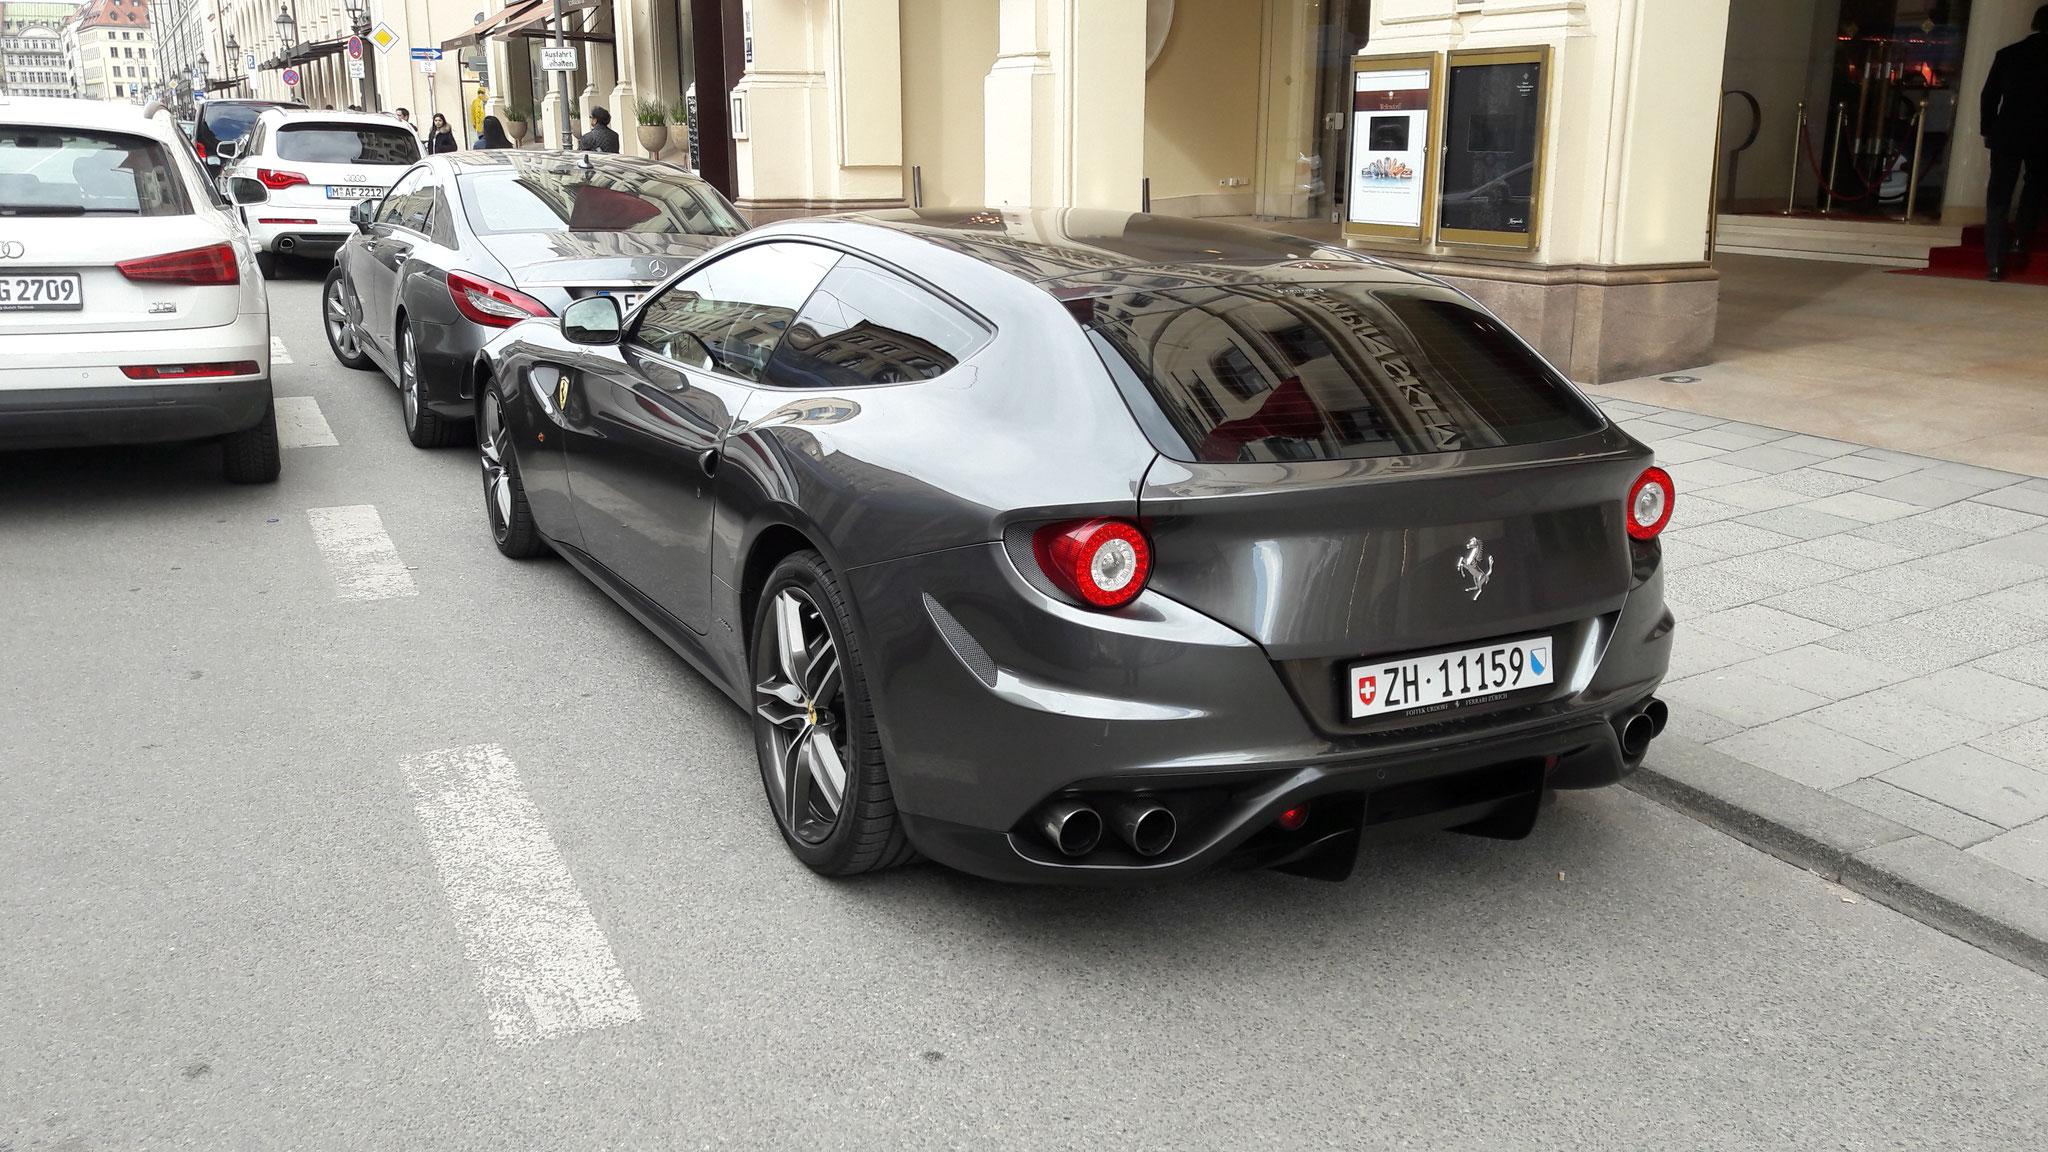 Ferrari FF - ZH-11159 (CH)